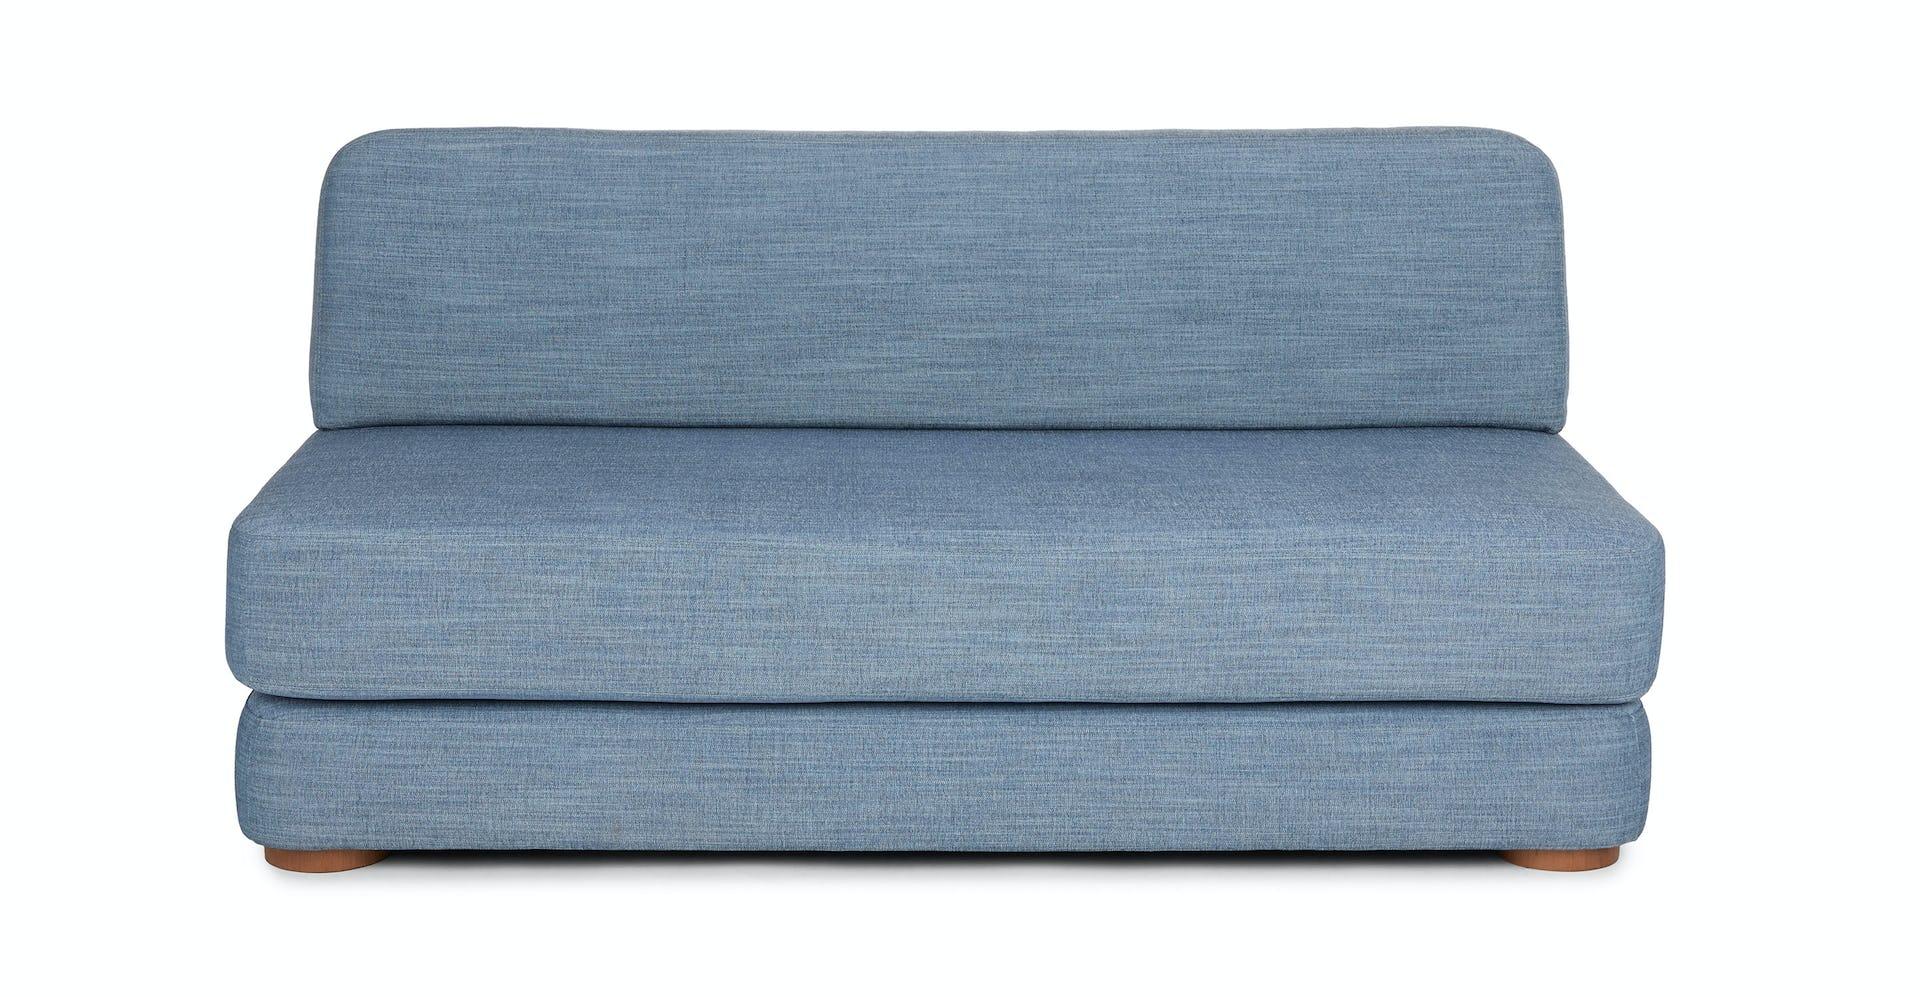 Admirable Simplis Bay Blue Sofa Ncnpc Chair Design For Home Ncnpcorg